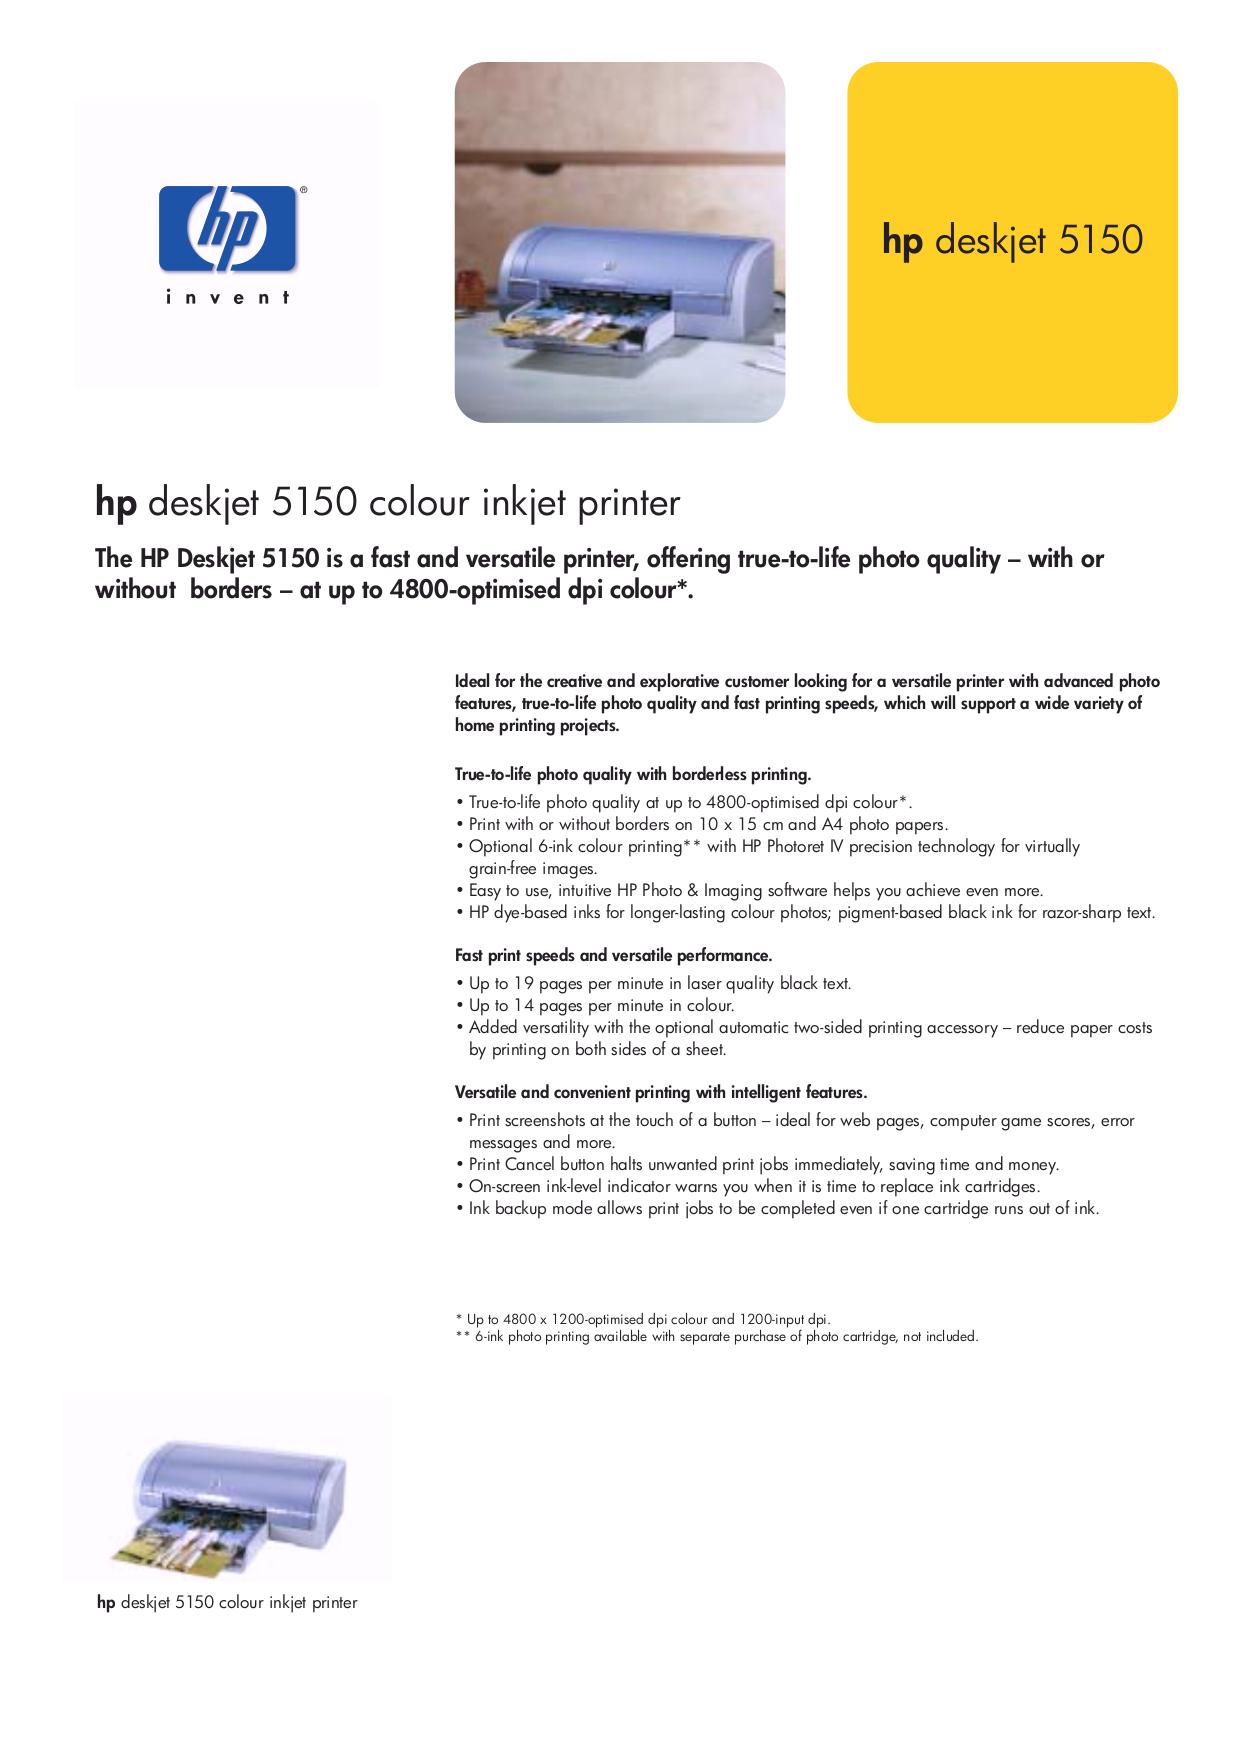 download free pdf for hp deskjet 5150 printer manual rh umlib com HP Printer 5130 HP Printer 5150 Troubleshooting